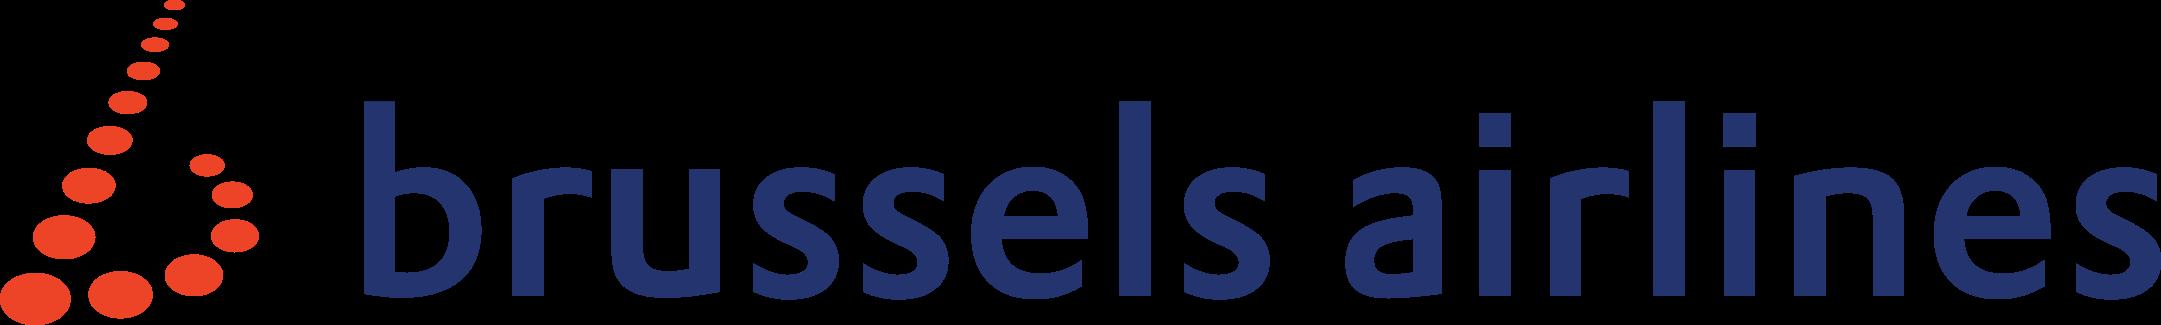 brussels airlines logo 1 - Brussels Airlines Logo